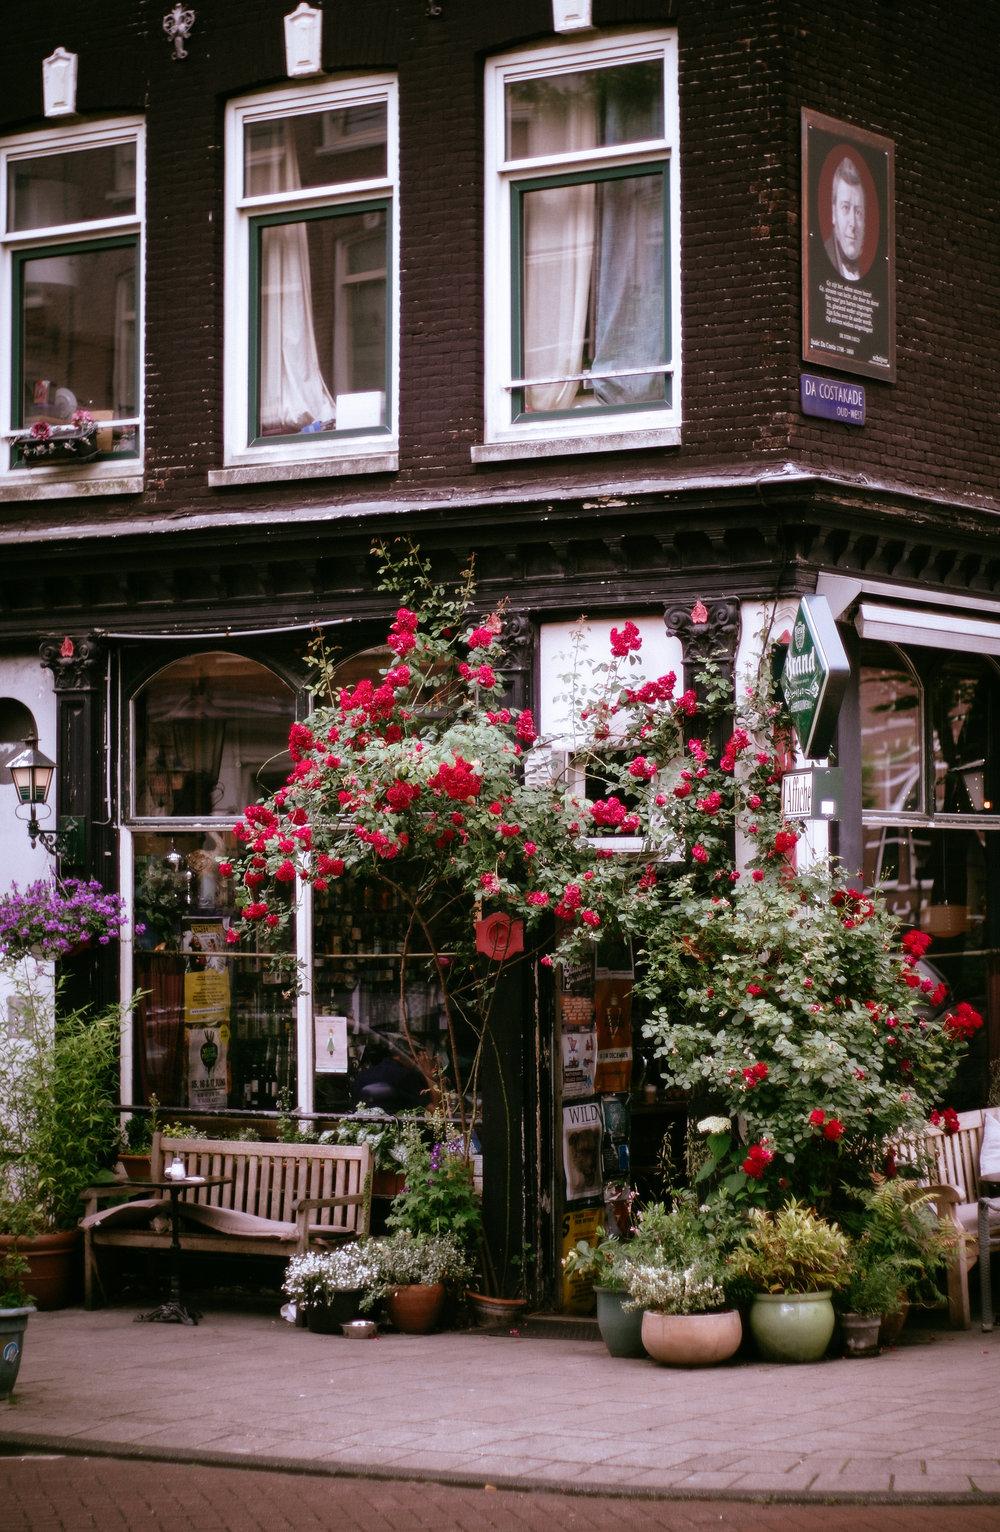 2018 JUNE Amsterdam Summer in the City-24.jpg